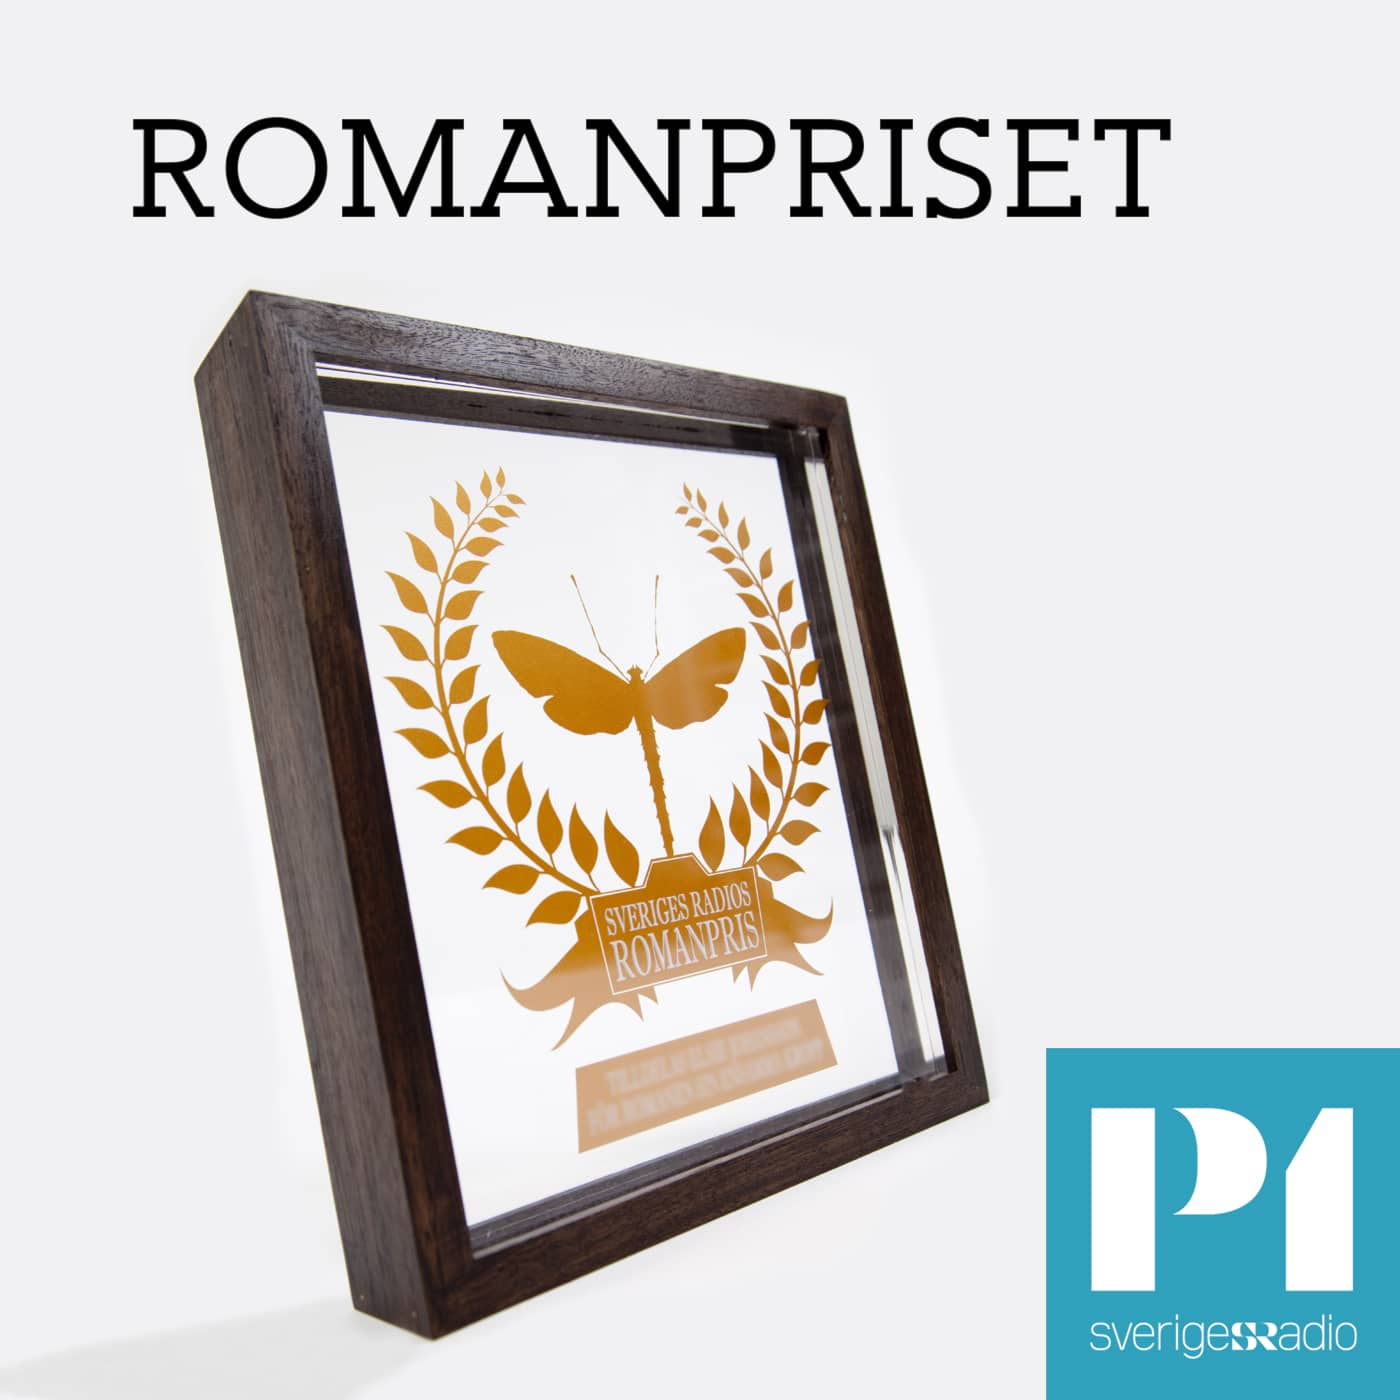 Sveriges Radios Romanpris